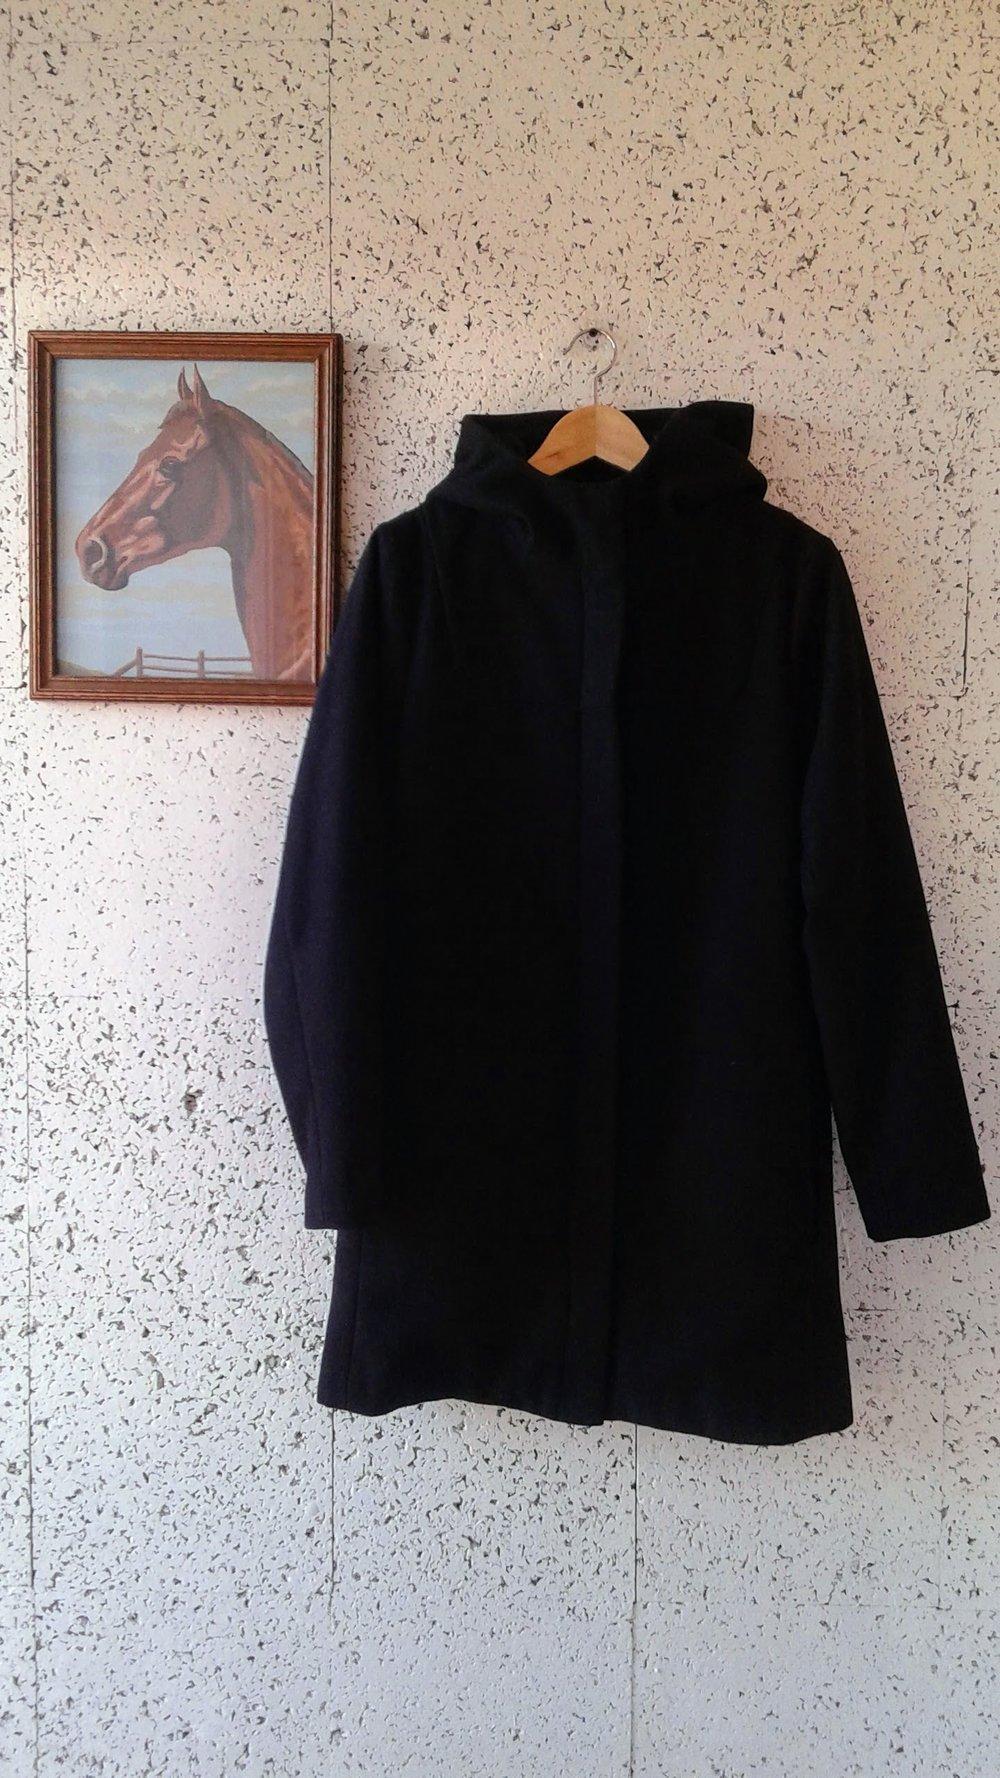 Twik coat; Size M, $64